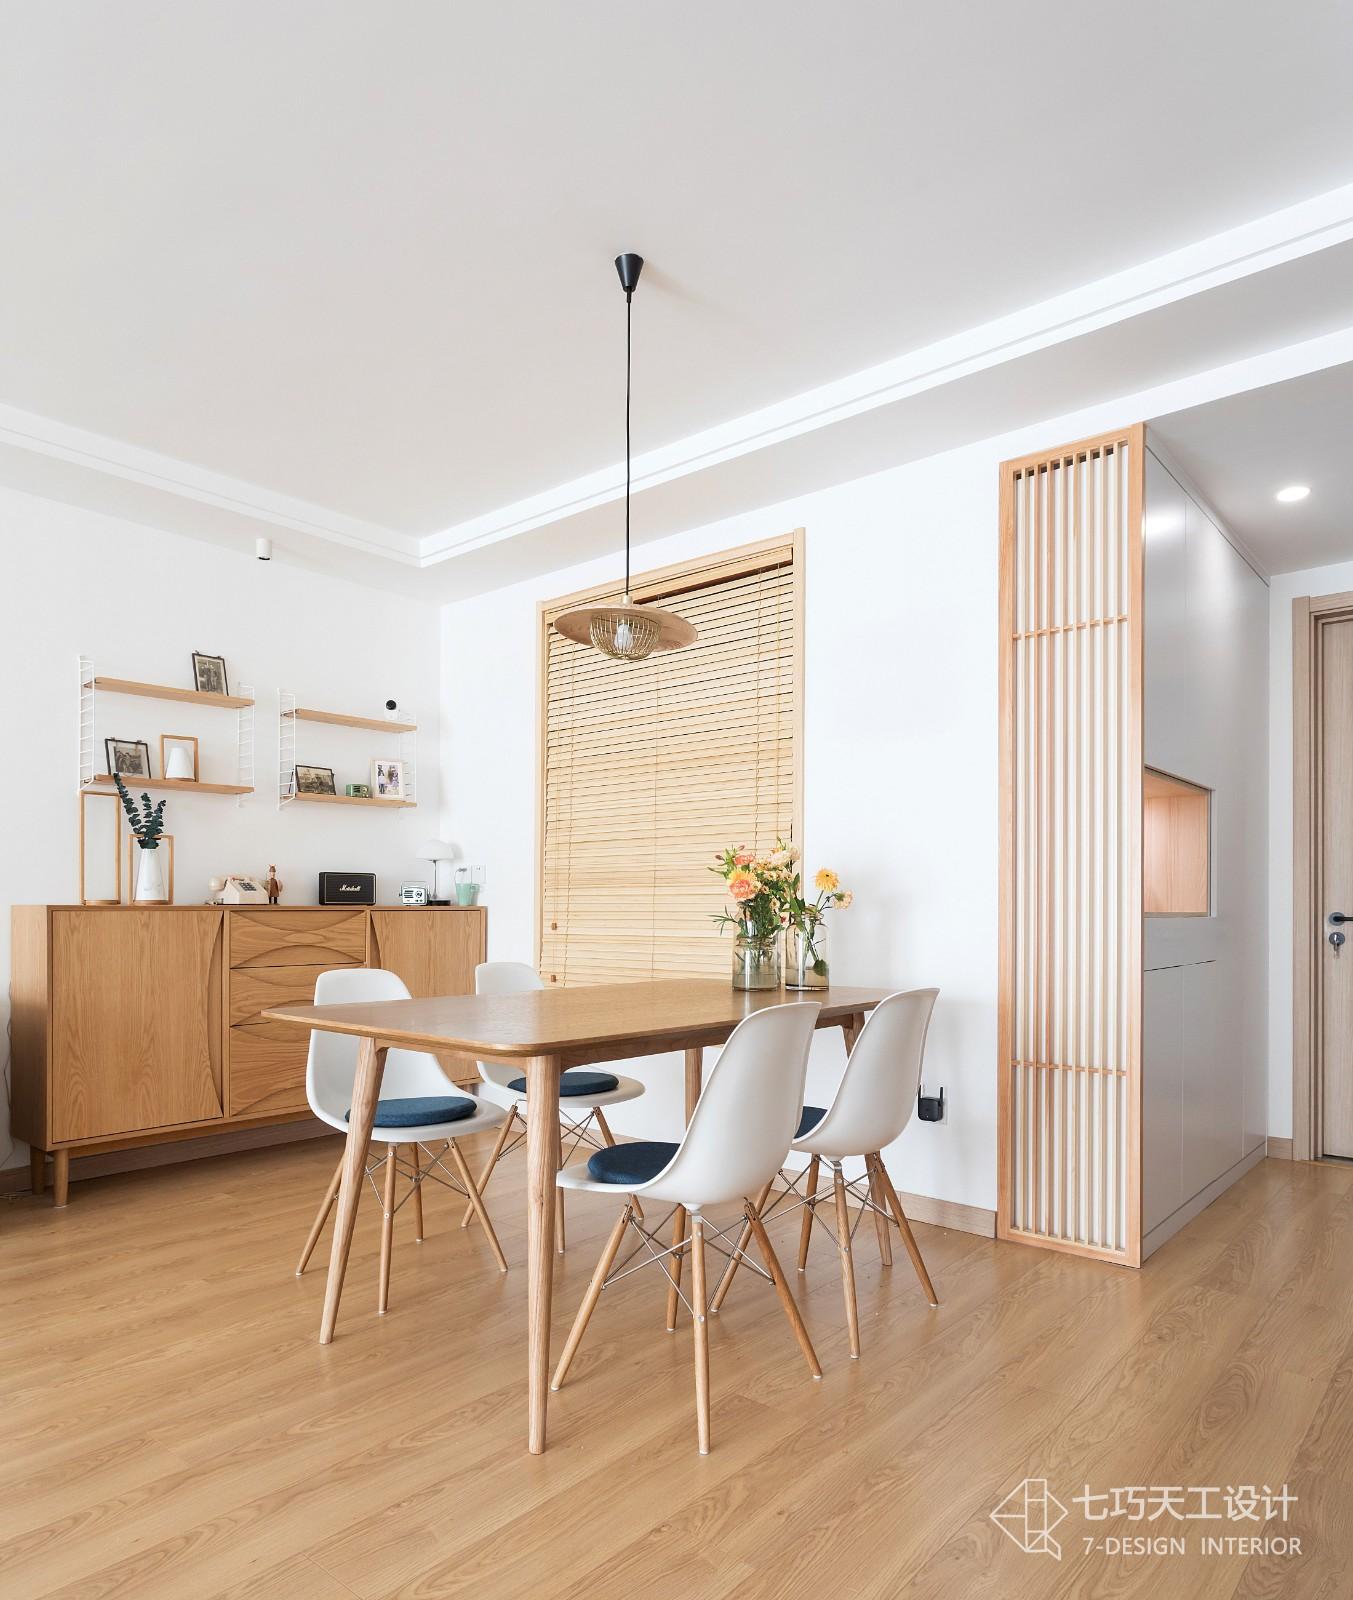 124m²极简muji风公寓厨房日式餐厅设计图片赏析